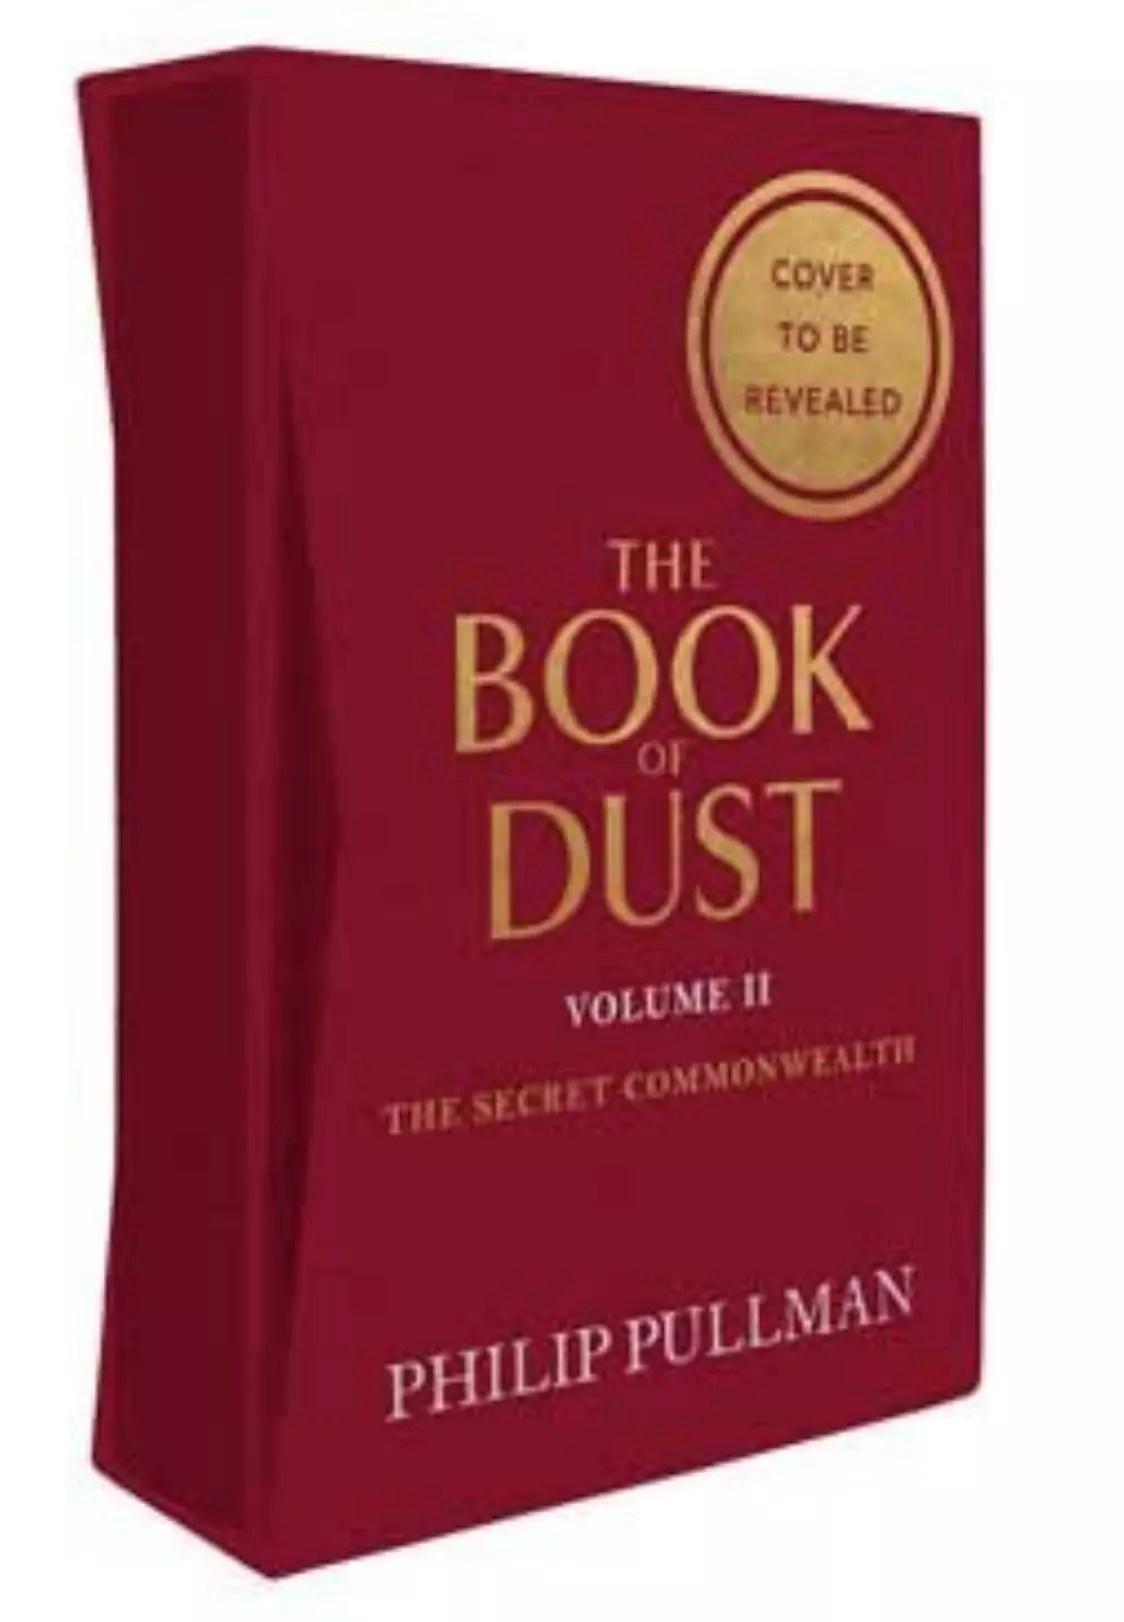 Philip Pullman Secret Commonwealth Book of Dust 2 slipcase TBA